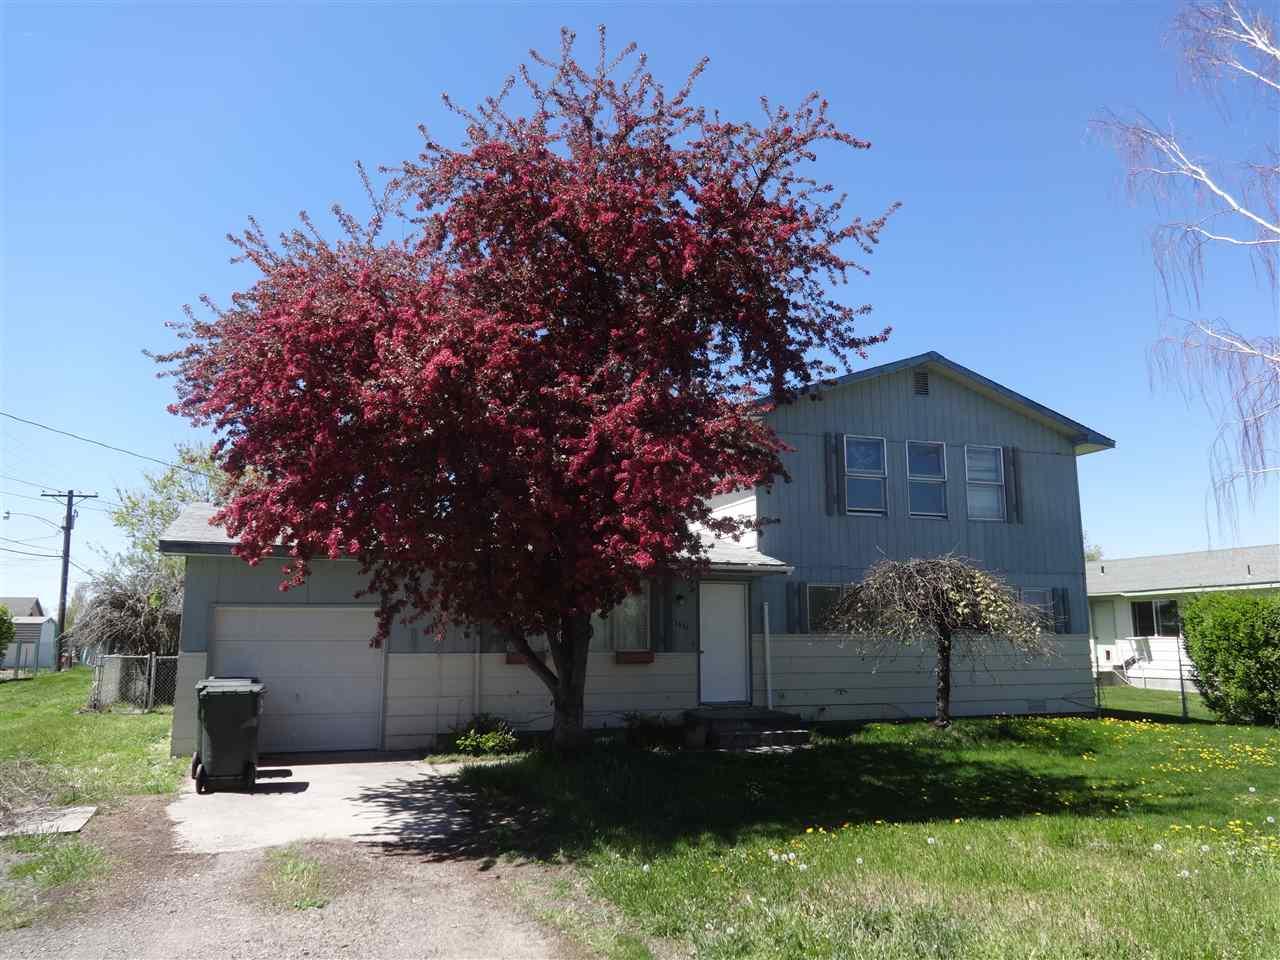 Single Family Home for Sale at 1631 R Street Heyburn, Idaho 83336